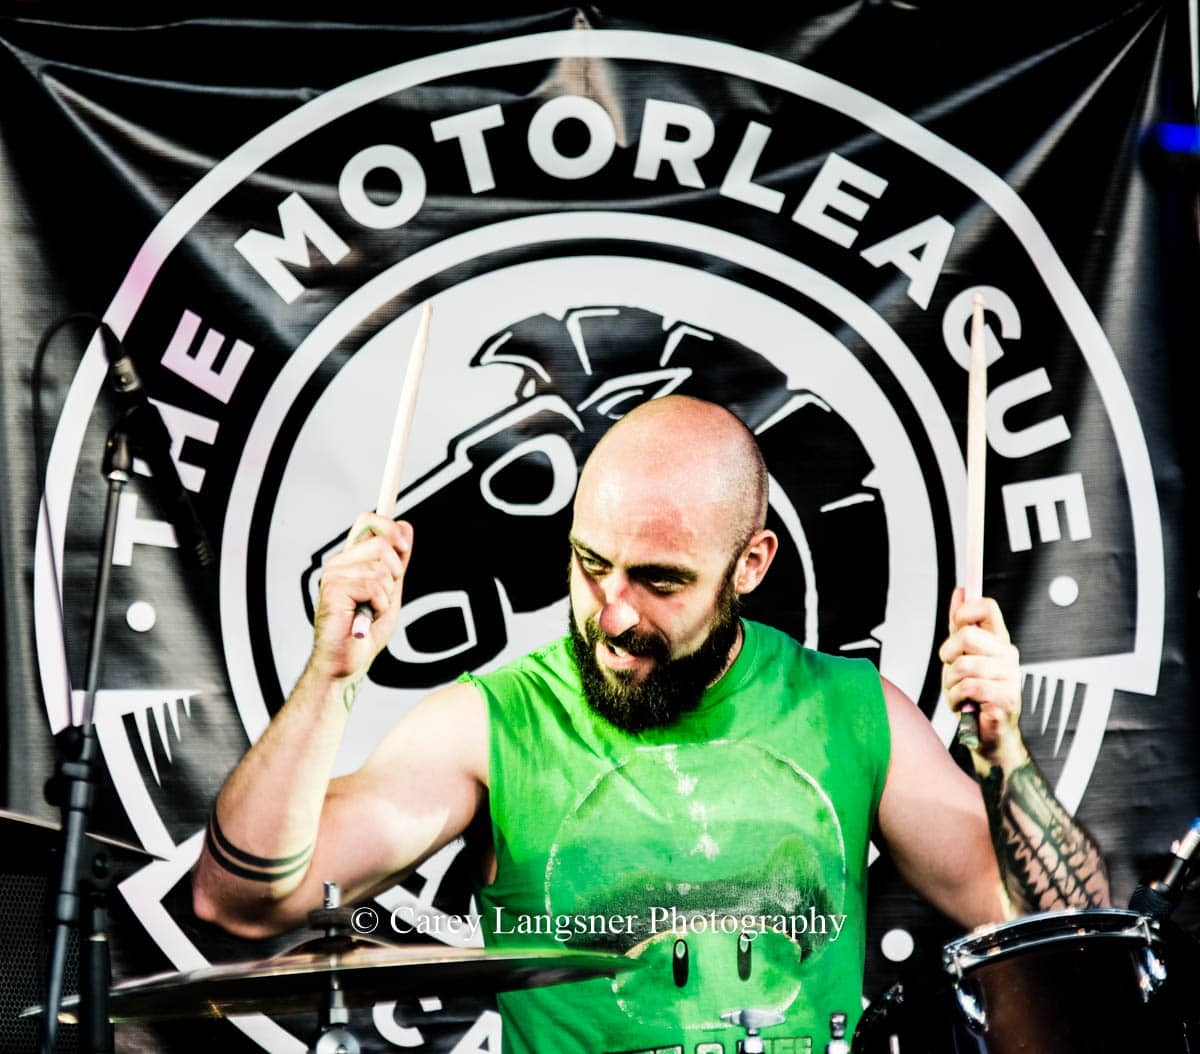 The Motorleague-1